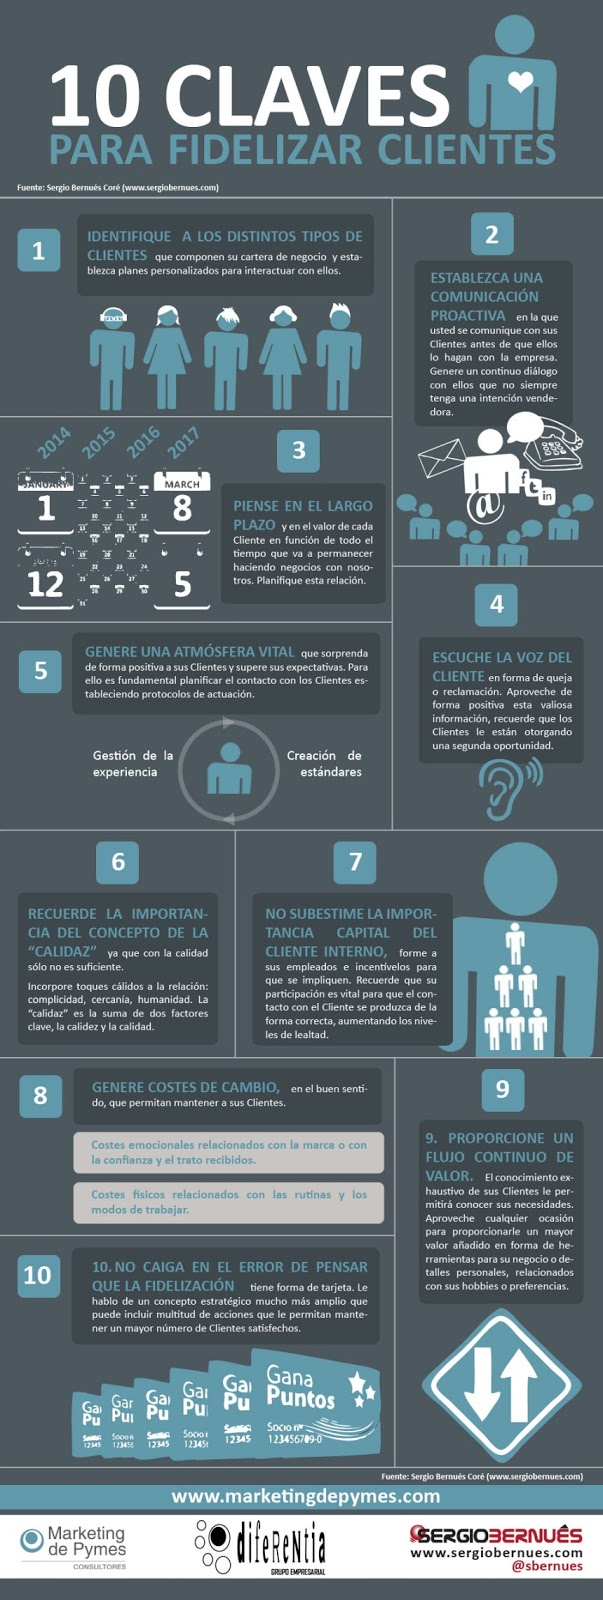 10 Claves para fidelizar clientes [Infografía]